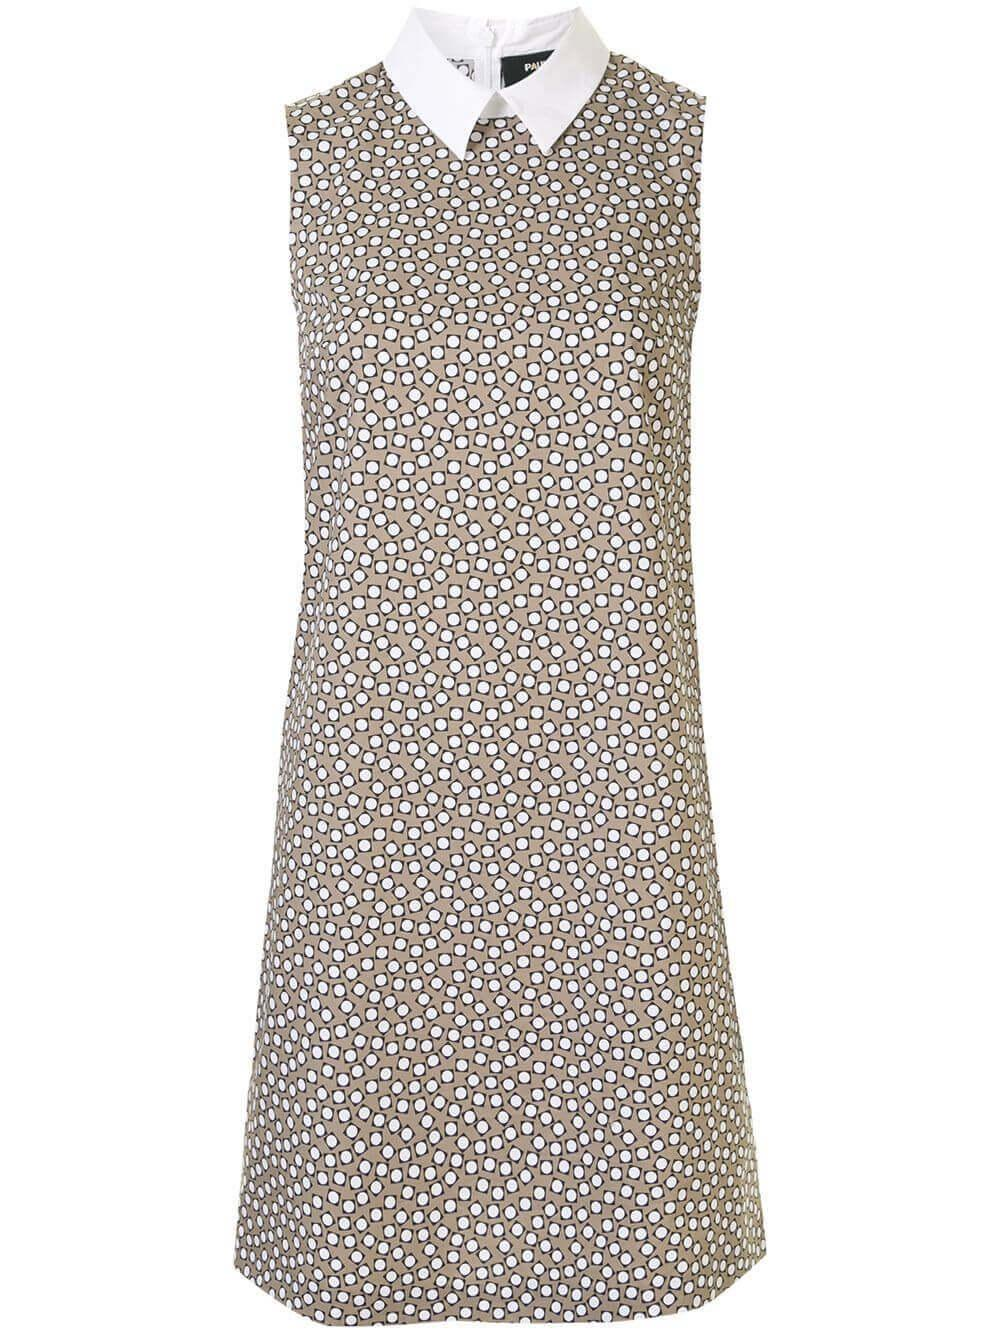 Dot Print Dress Item # 186/R069